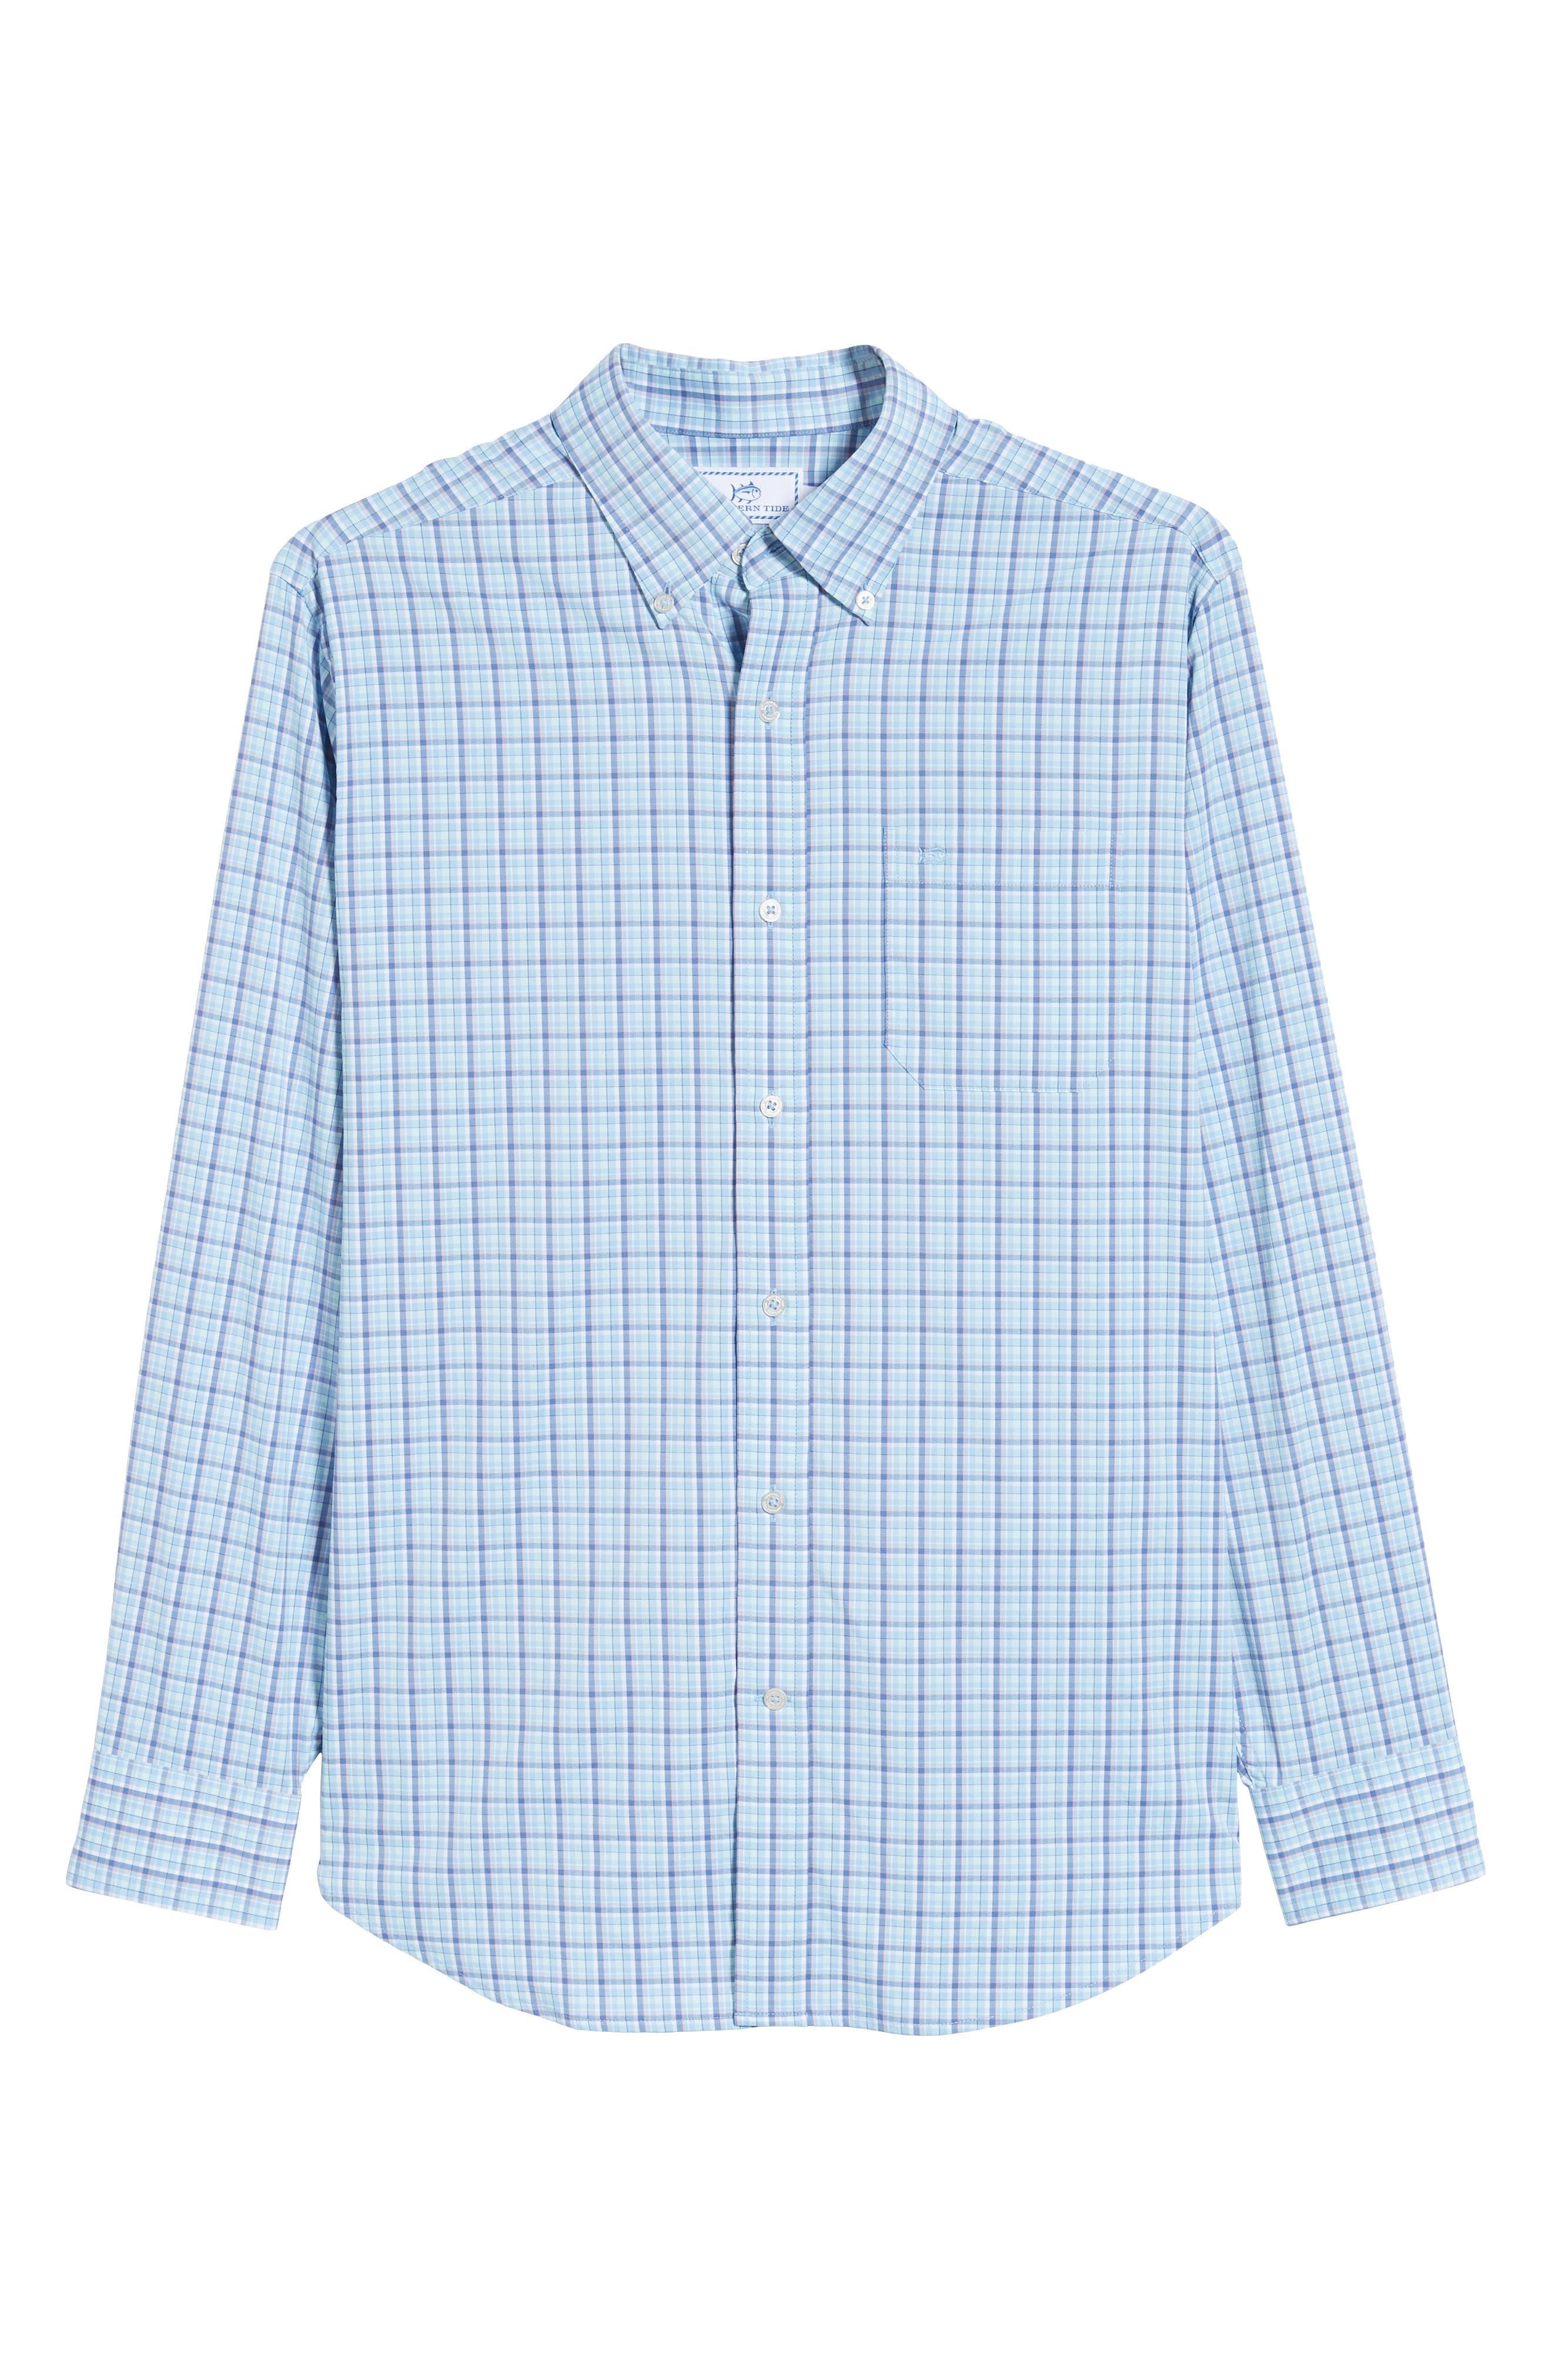 Staycation Intercoastal Regular Fit Plaid Performance Sport Shirt,                             Alternate thumbnail 5, color,                             SKY BLUE